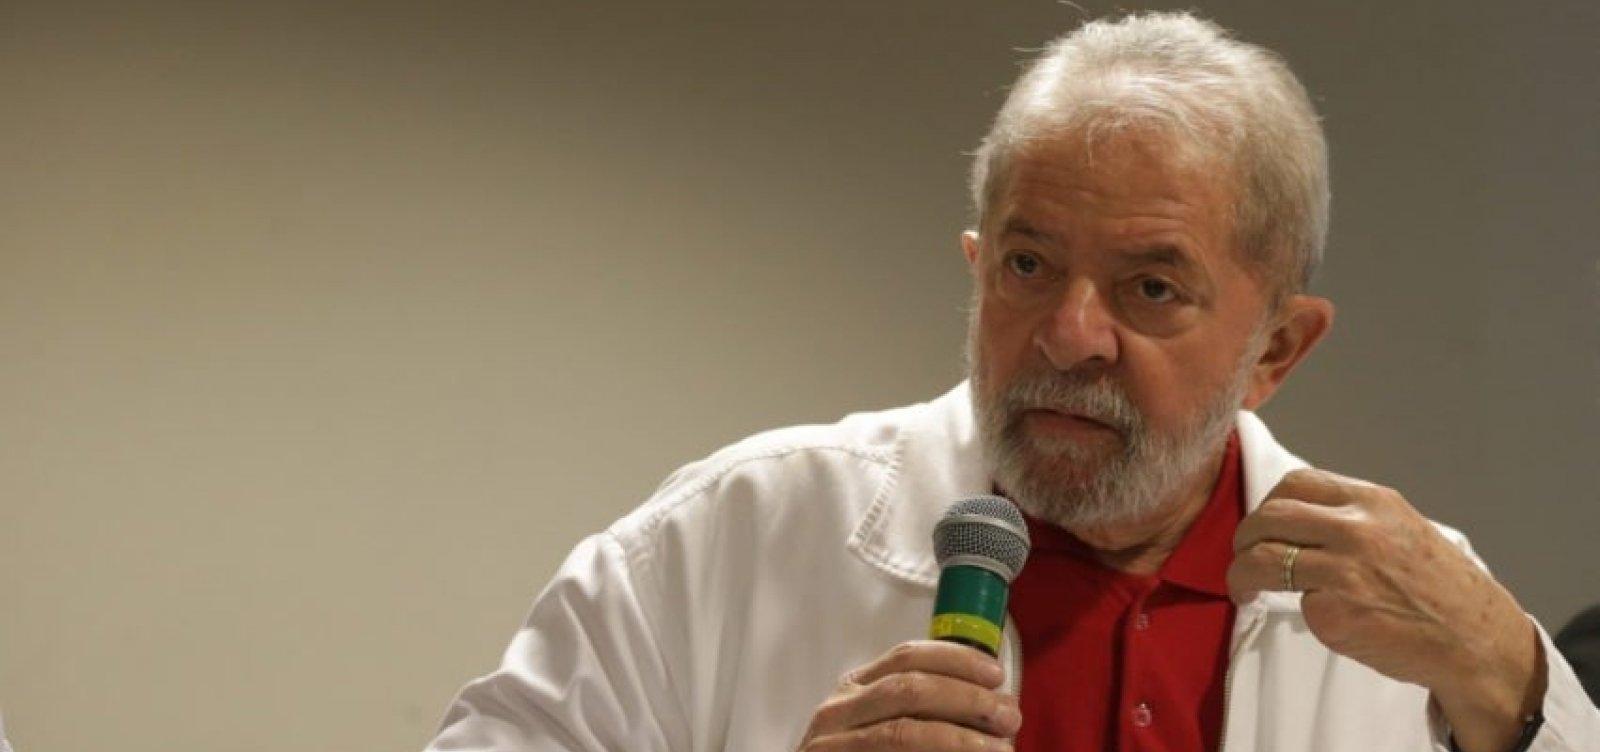 [Lula pede liberdade ao STF e acusa Moro de perda de imparcialidade]